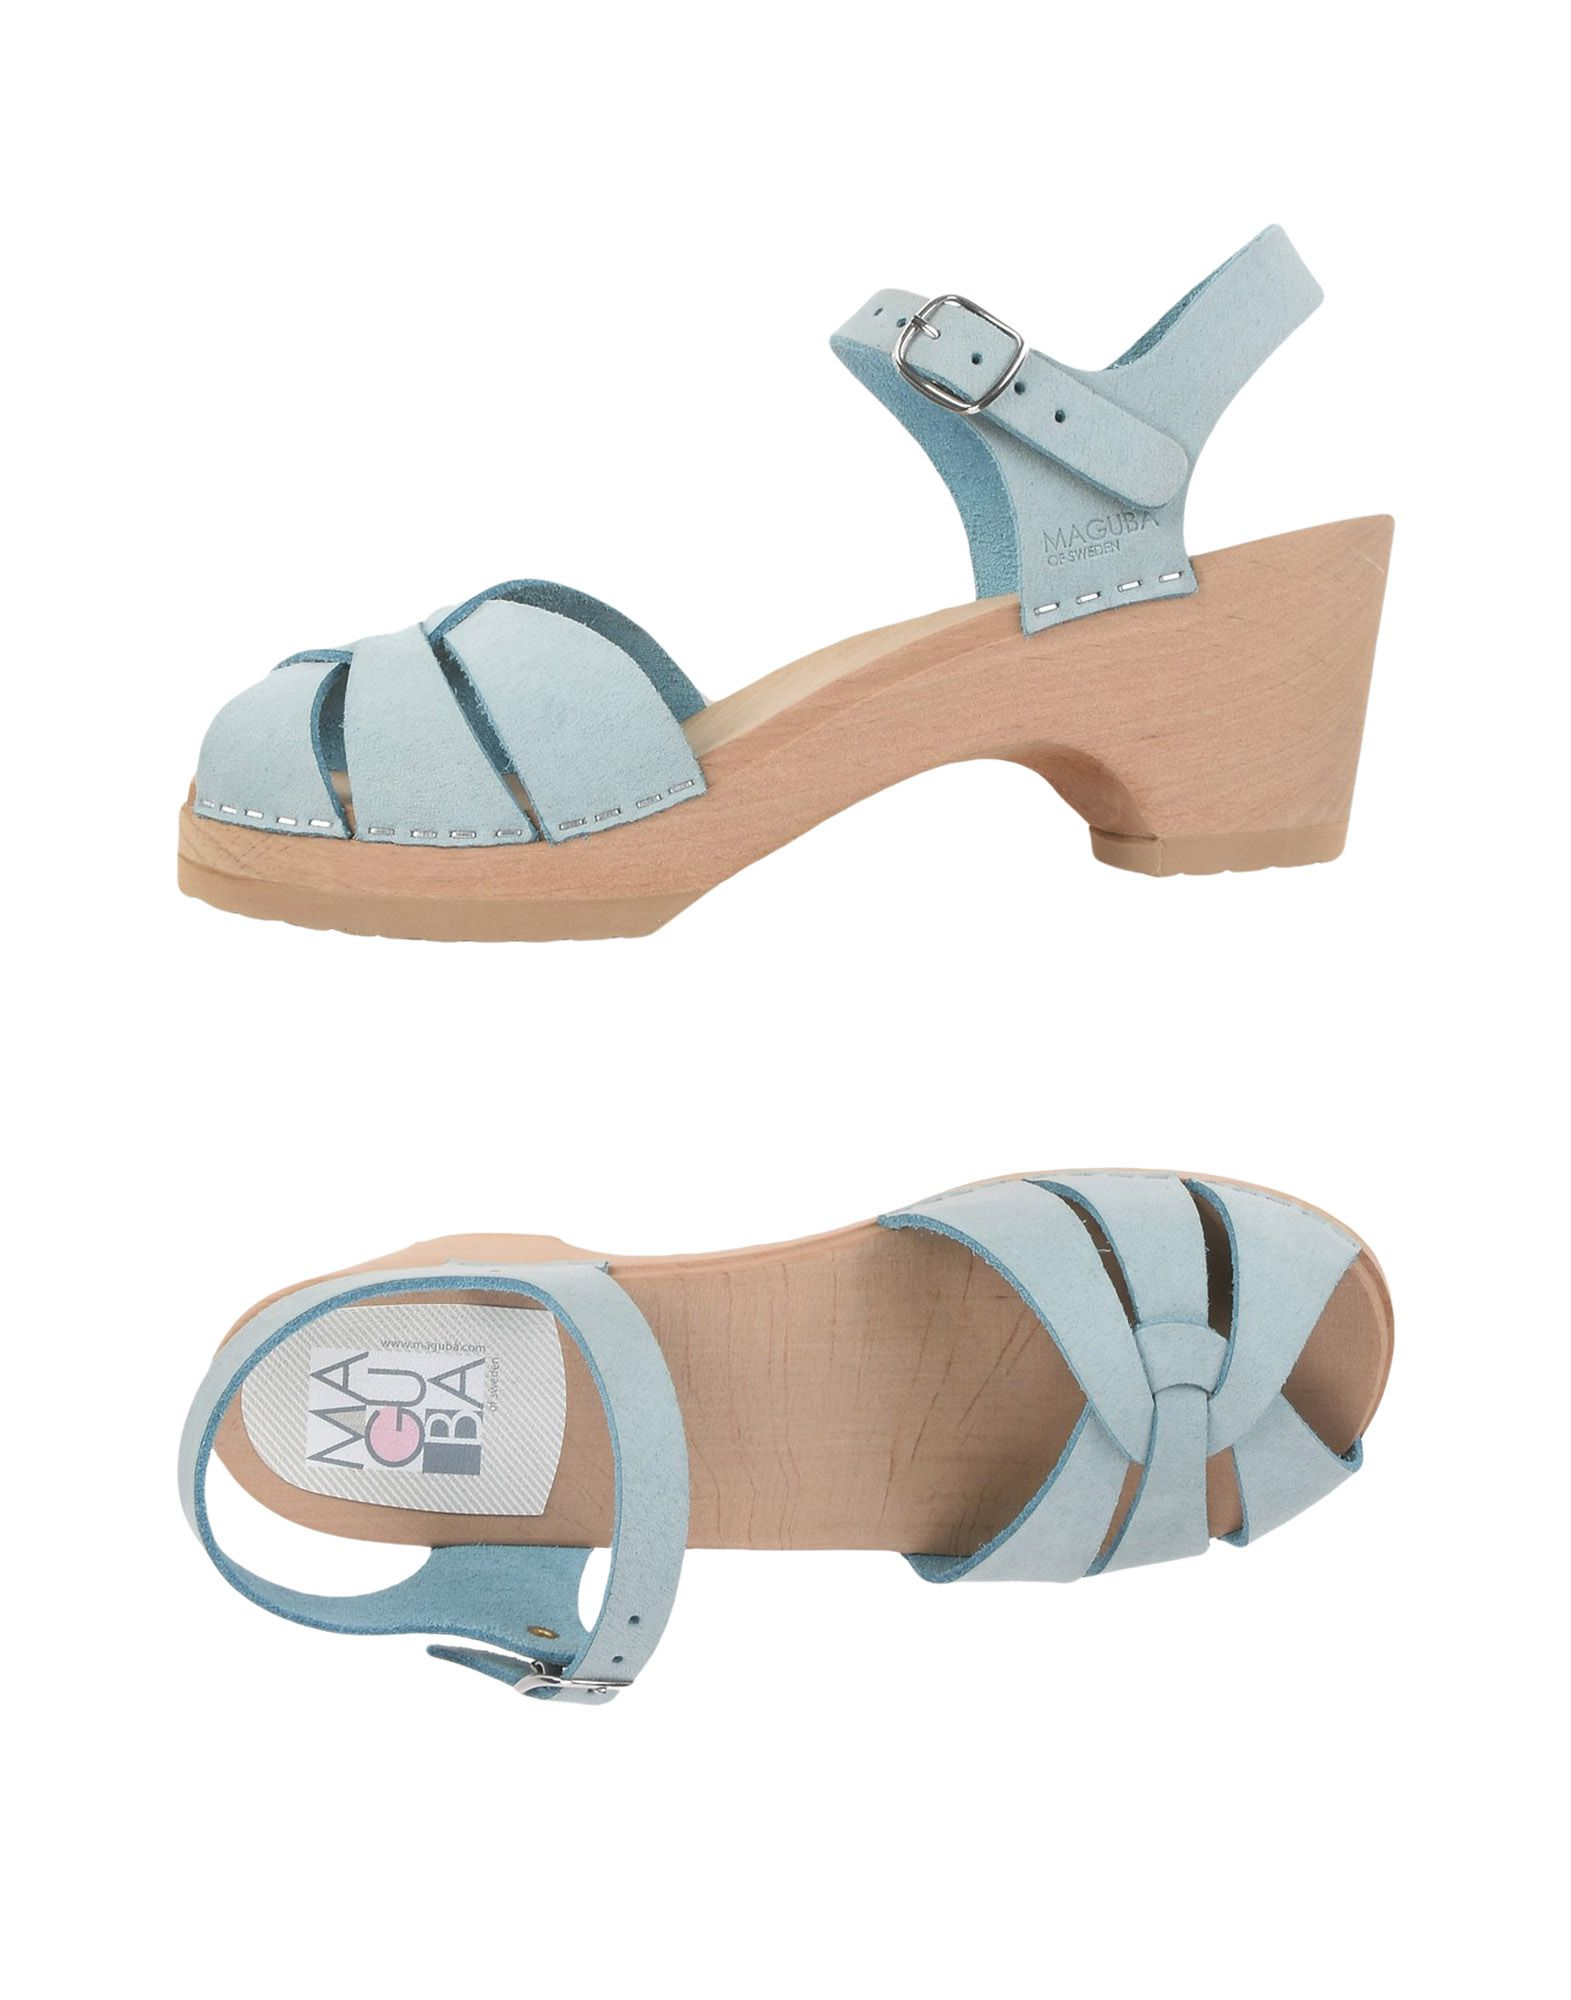 Haltbare Mode billige Schuhe Maguba Salvador_Low  11469287QV Neue Schuhe